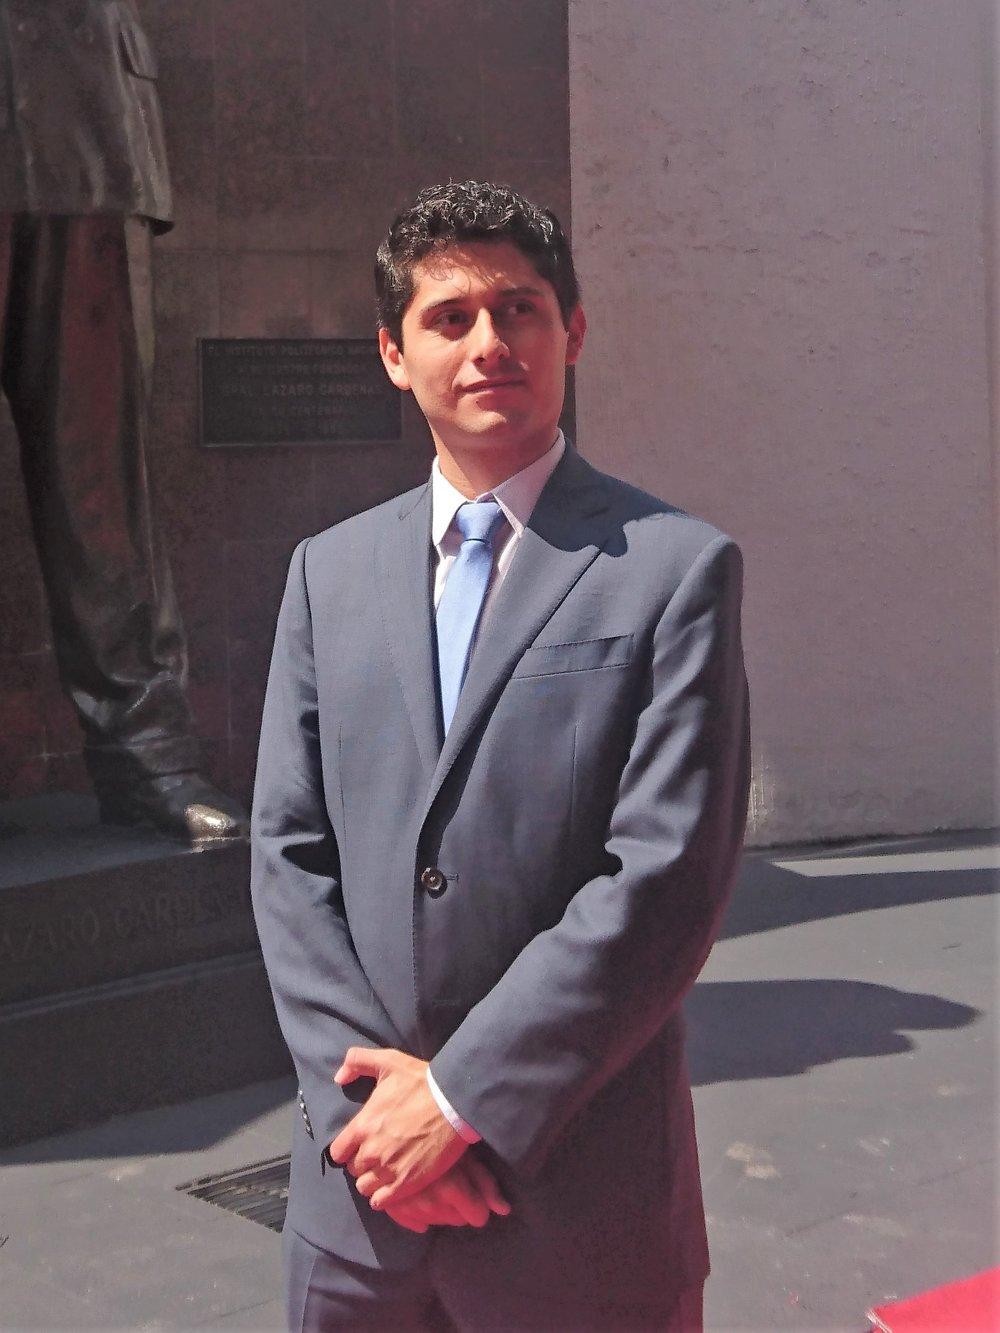 Daniel Domínguez-Gómez - Daniel Dominguez.jpg